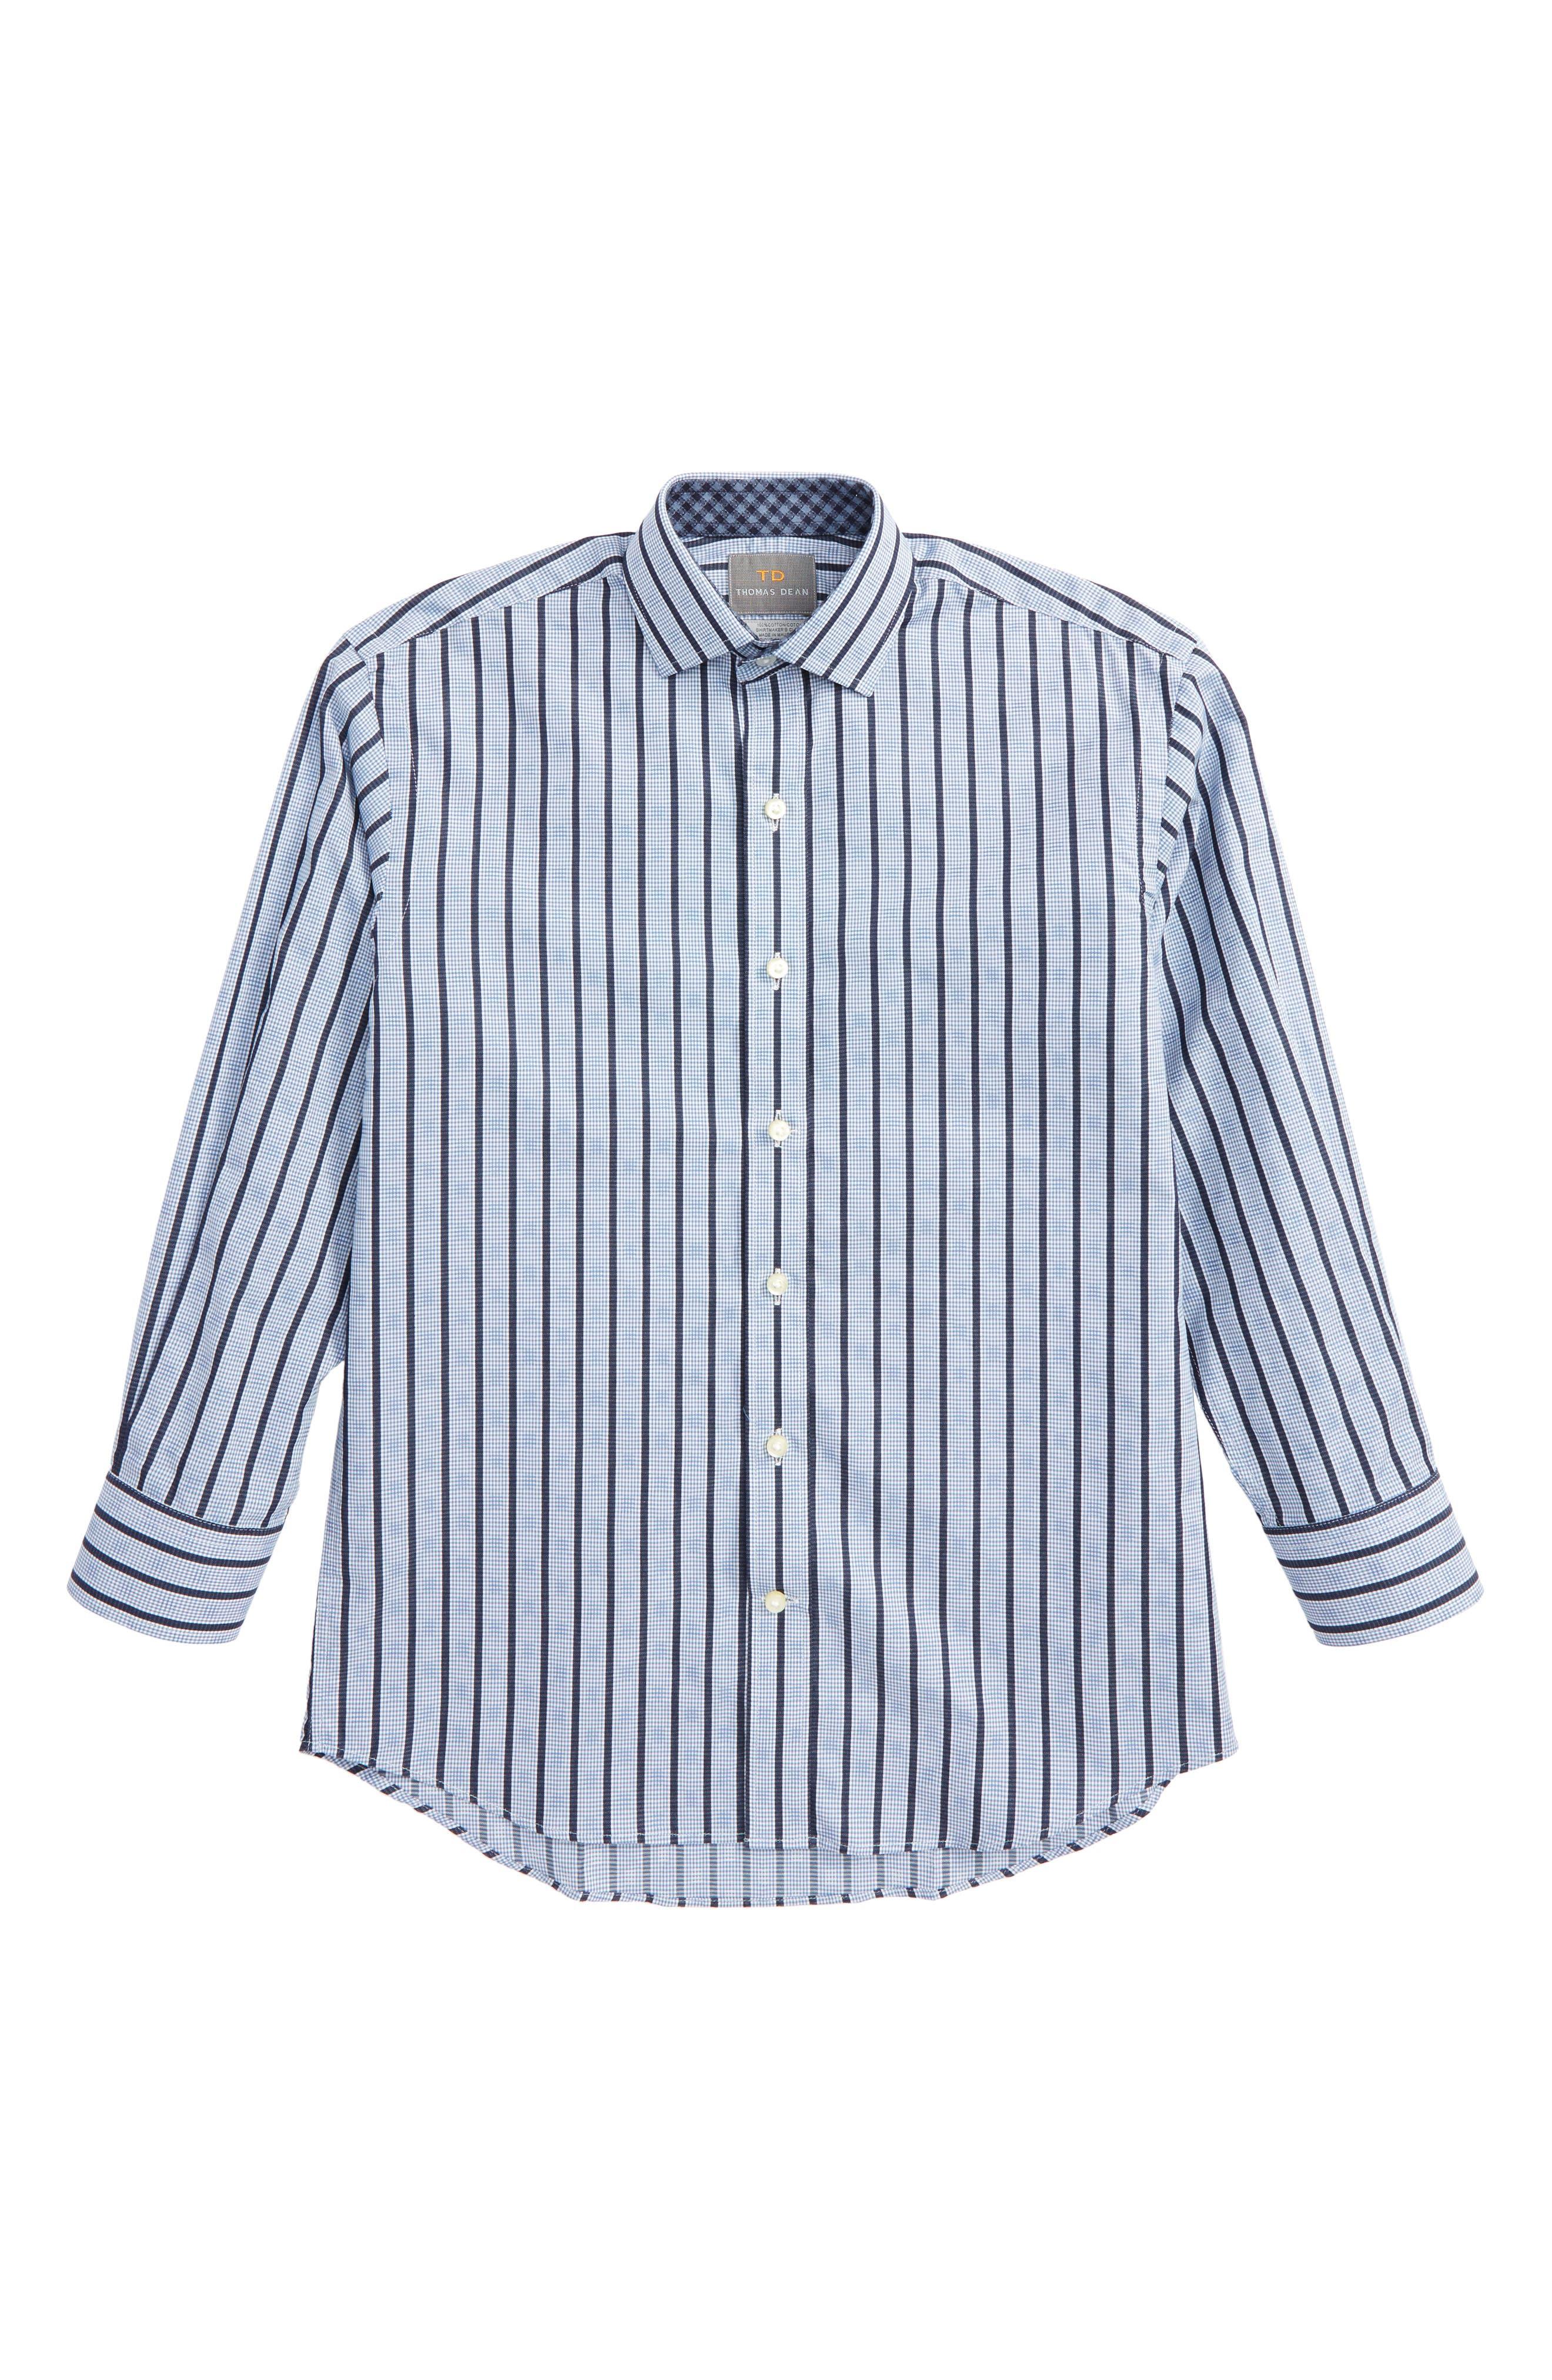 Stripe & Check Dress Shirt,                             Main thumbnail 1, color,                             400